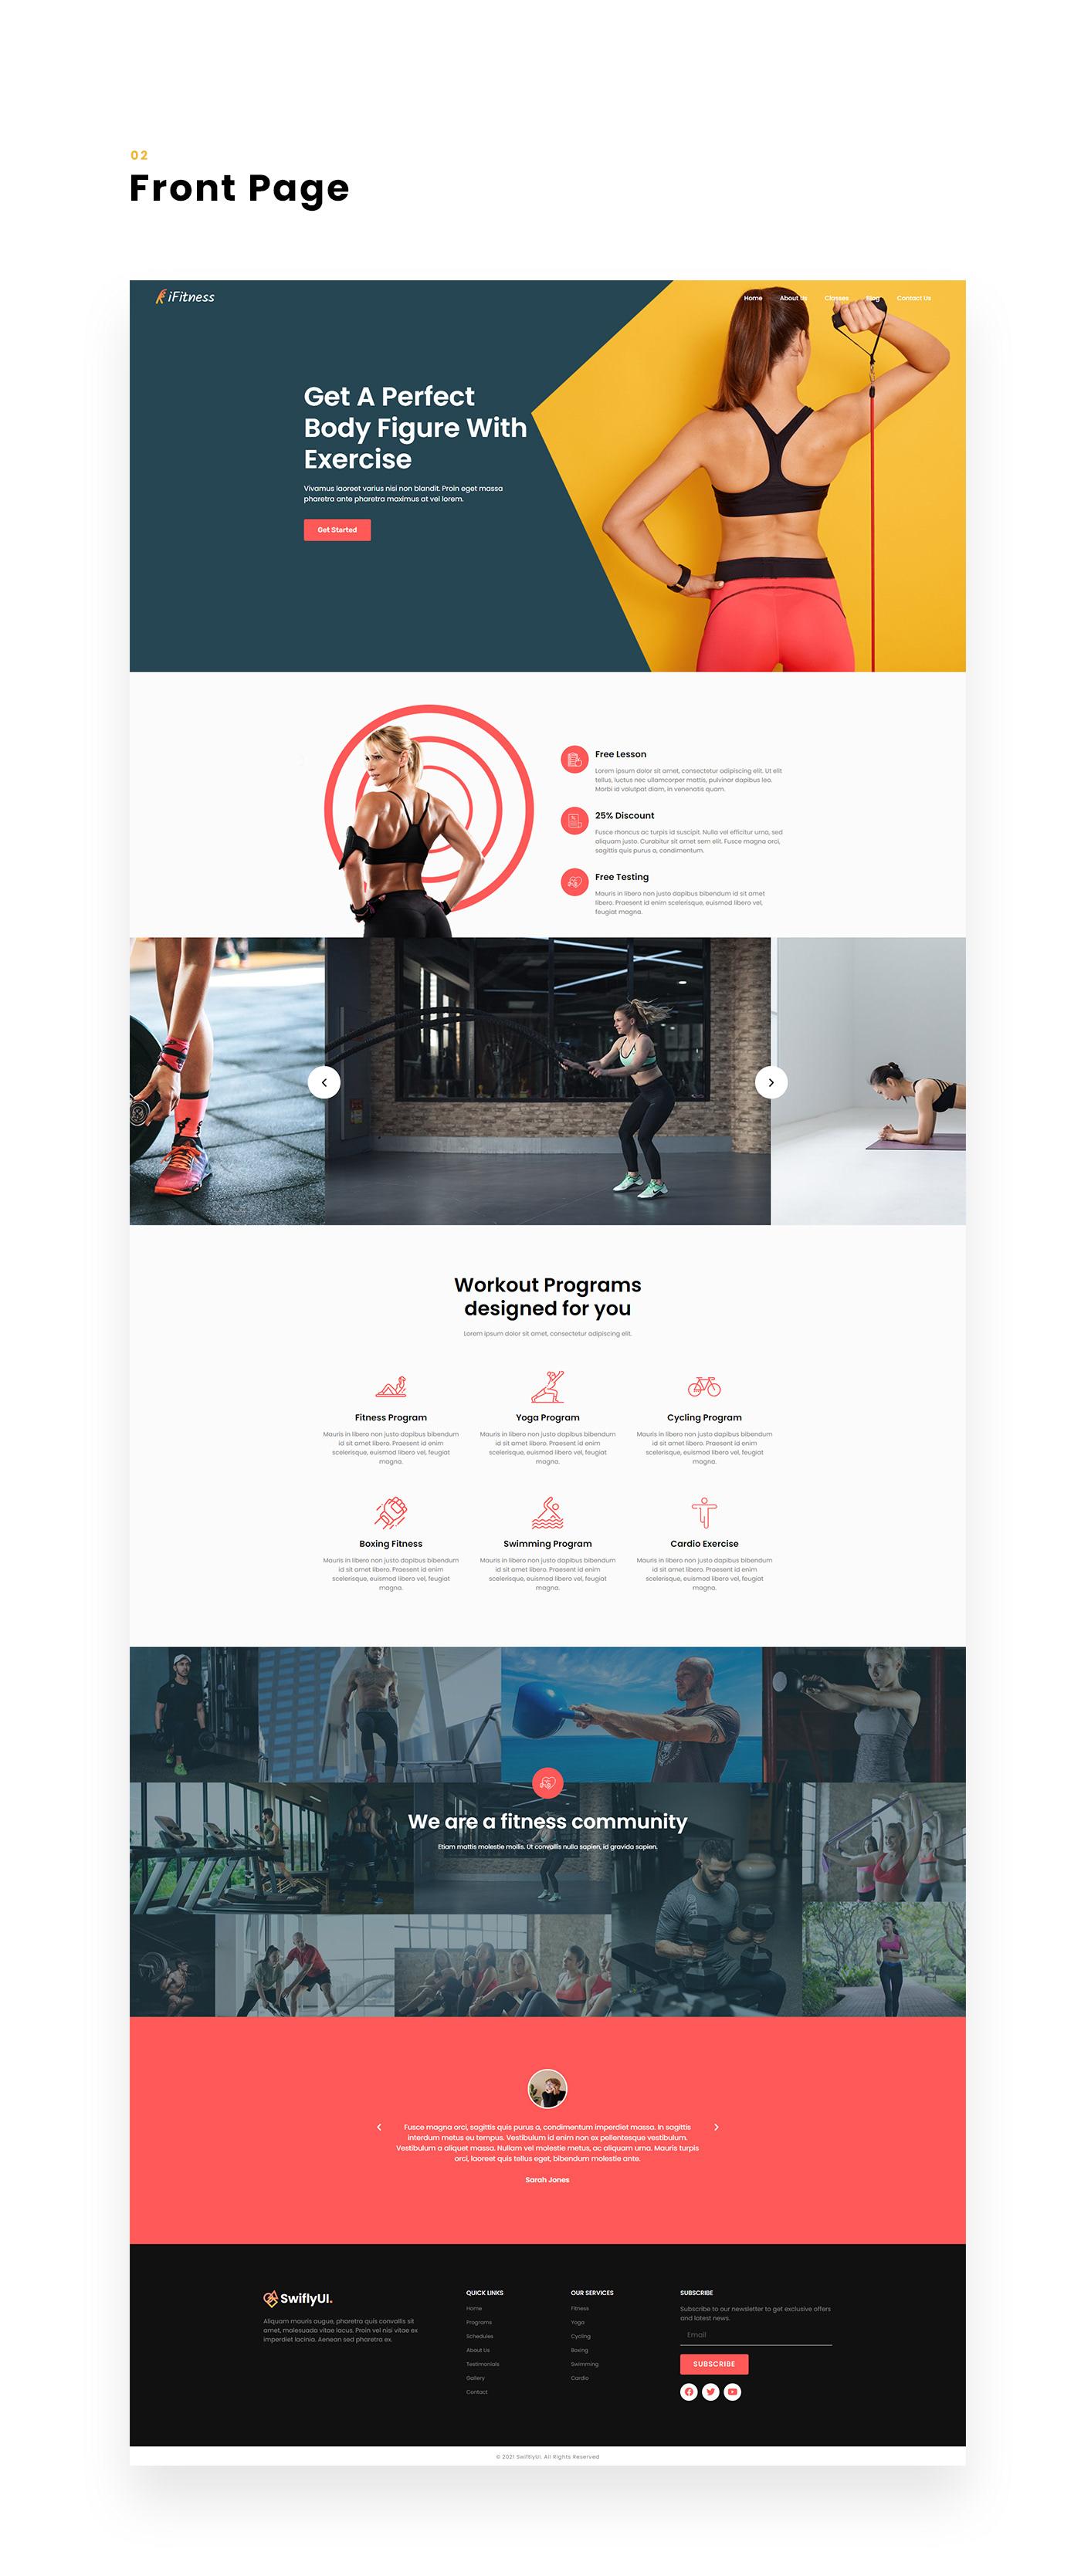 Adobe Photoshop Adobe XD elementor pro Figma fitness fitness website